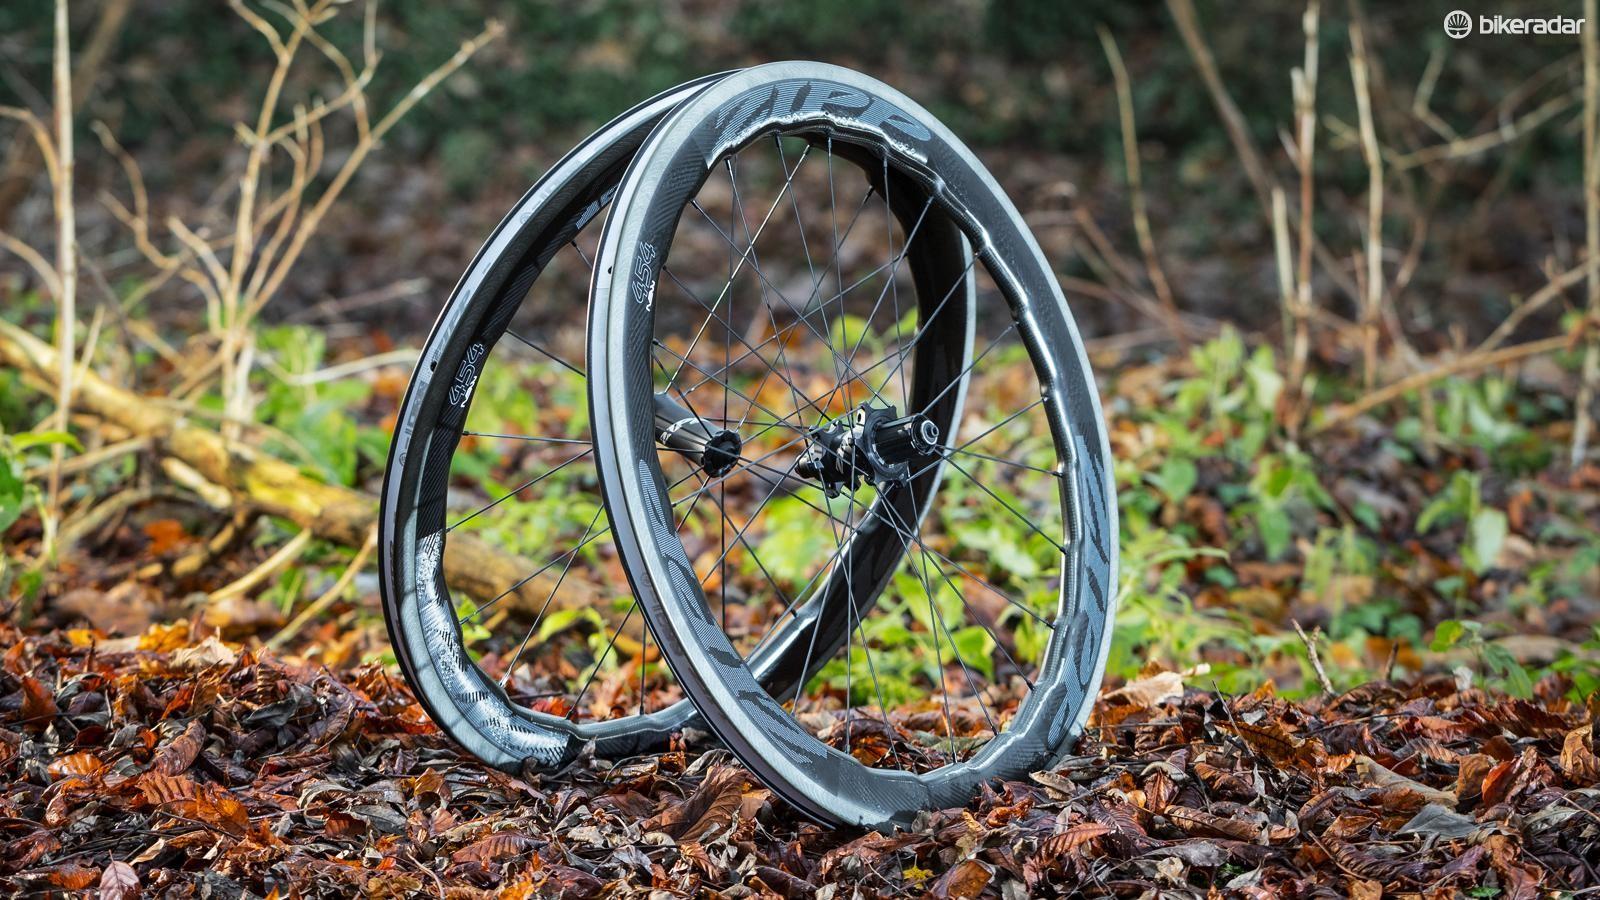 Zipp's 454 NSW wheels